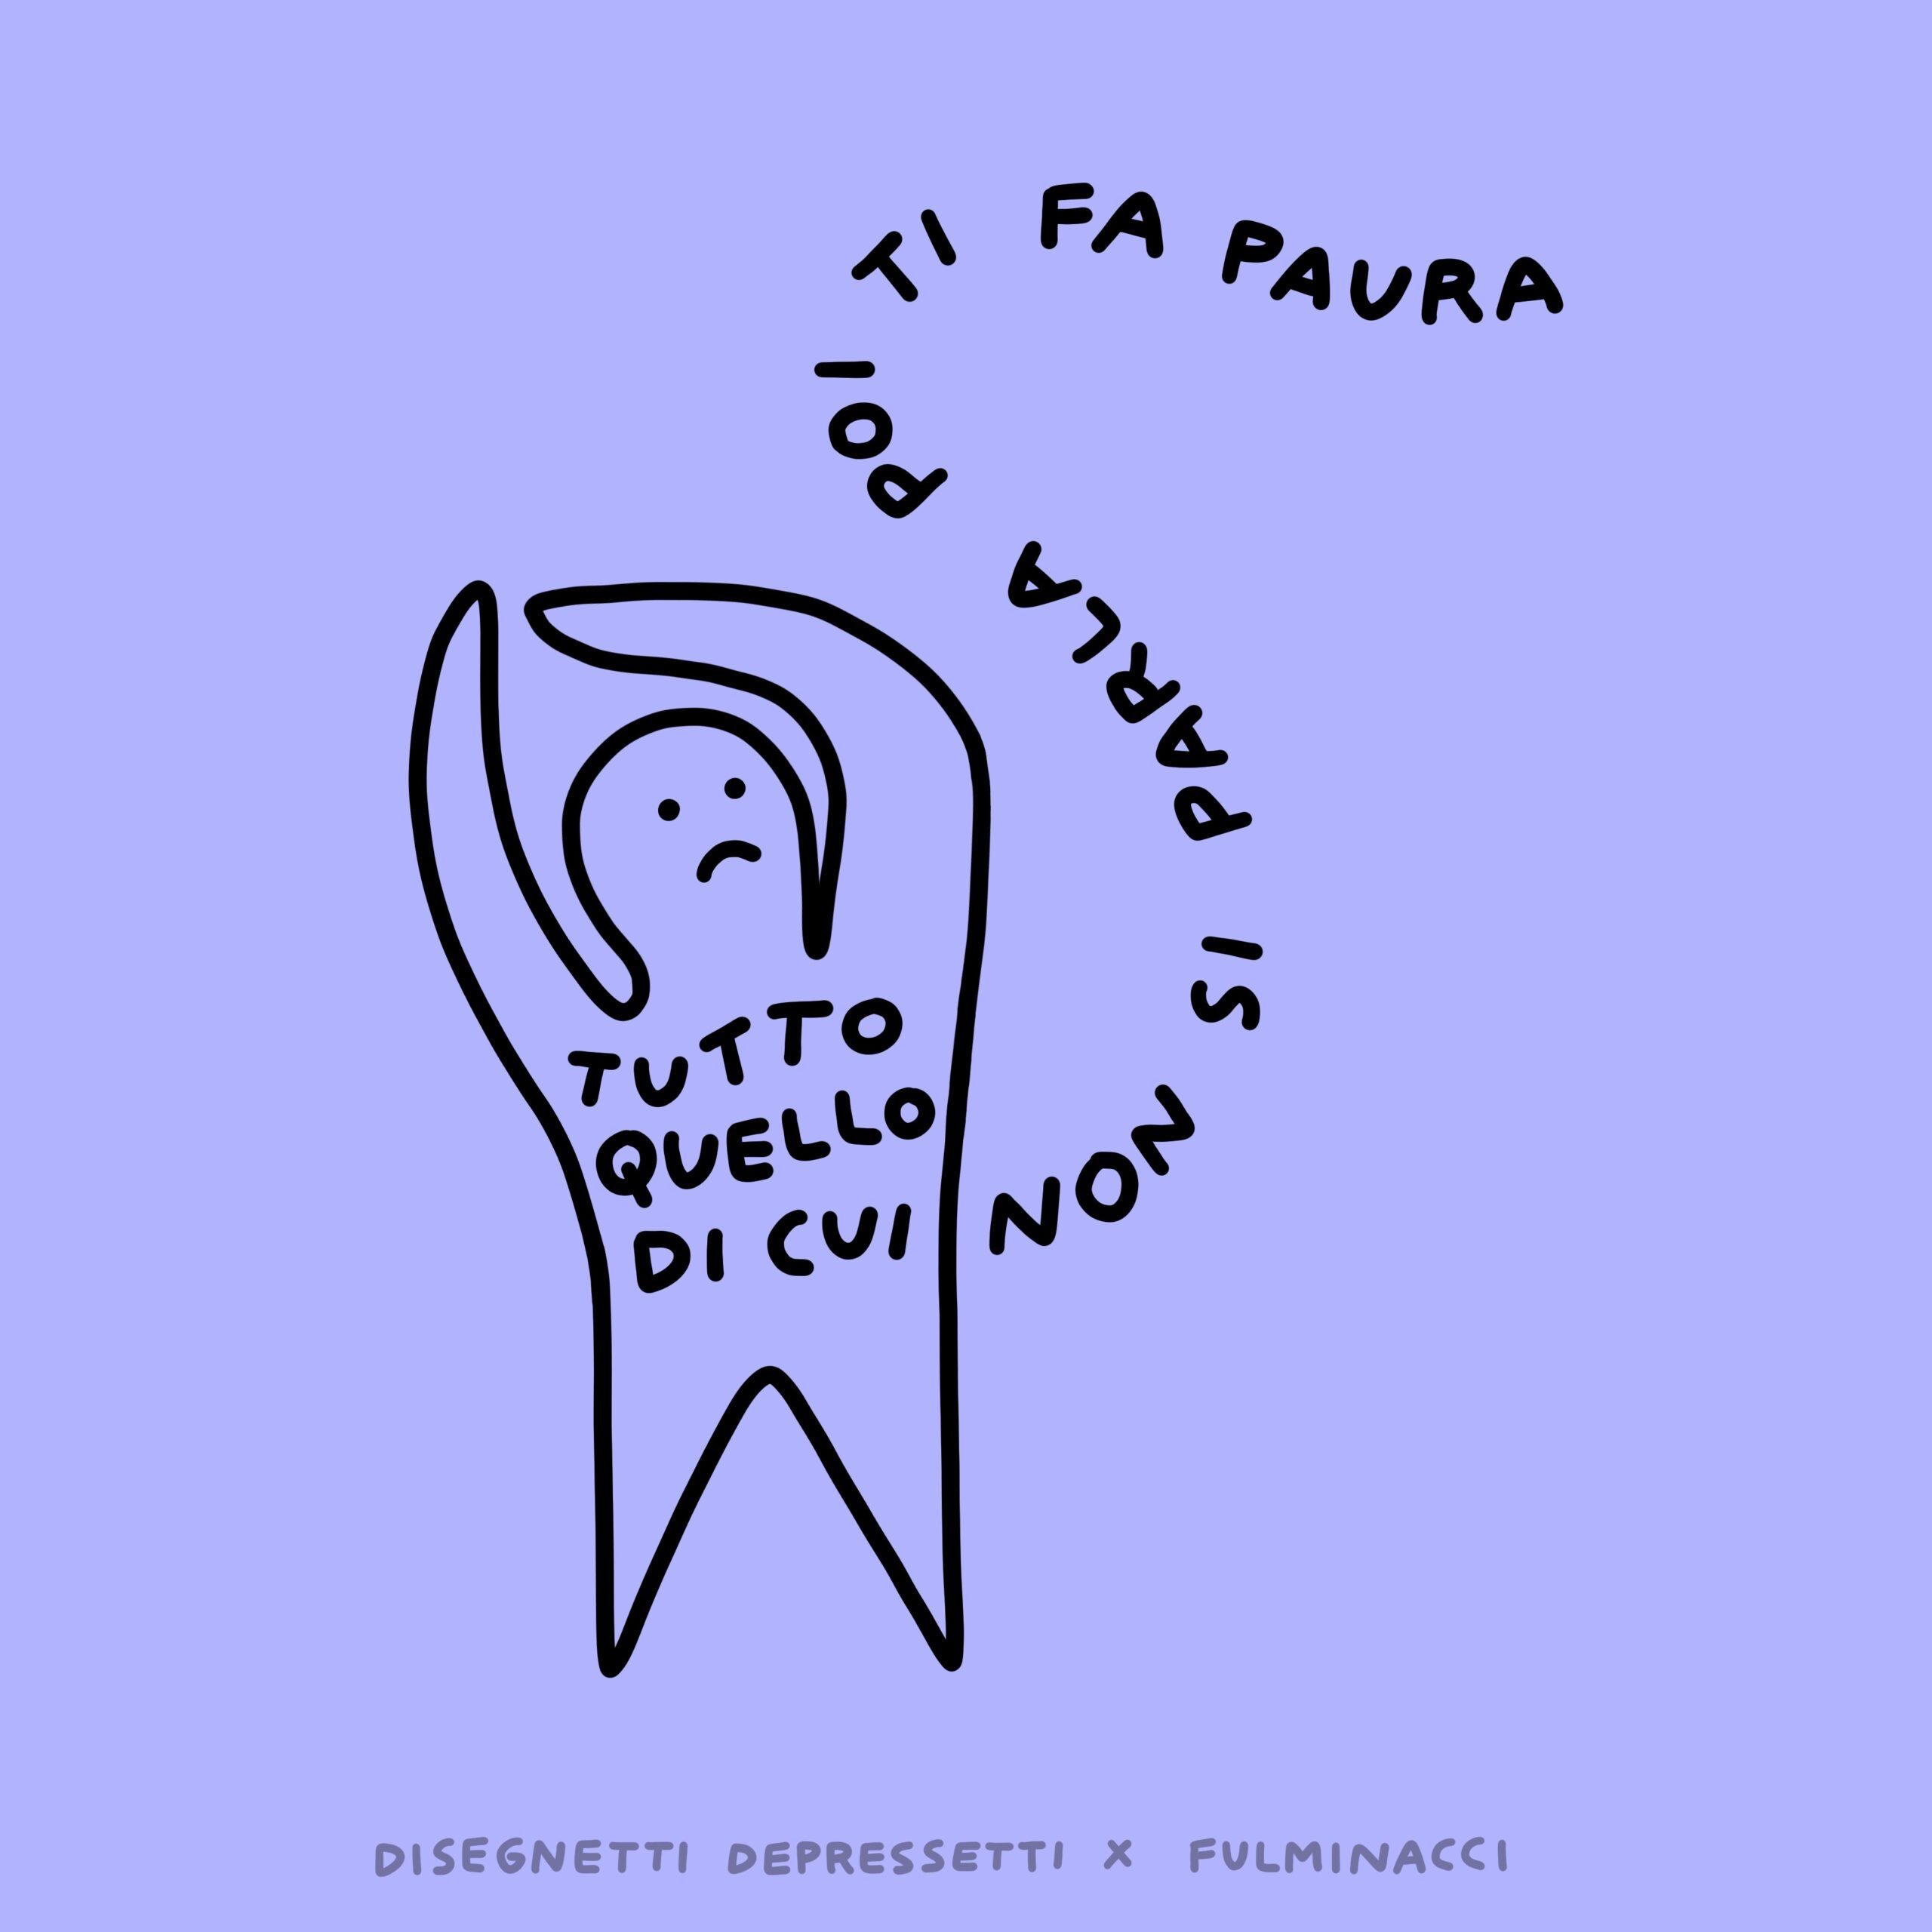 fulminacci_paura2